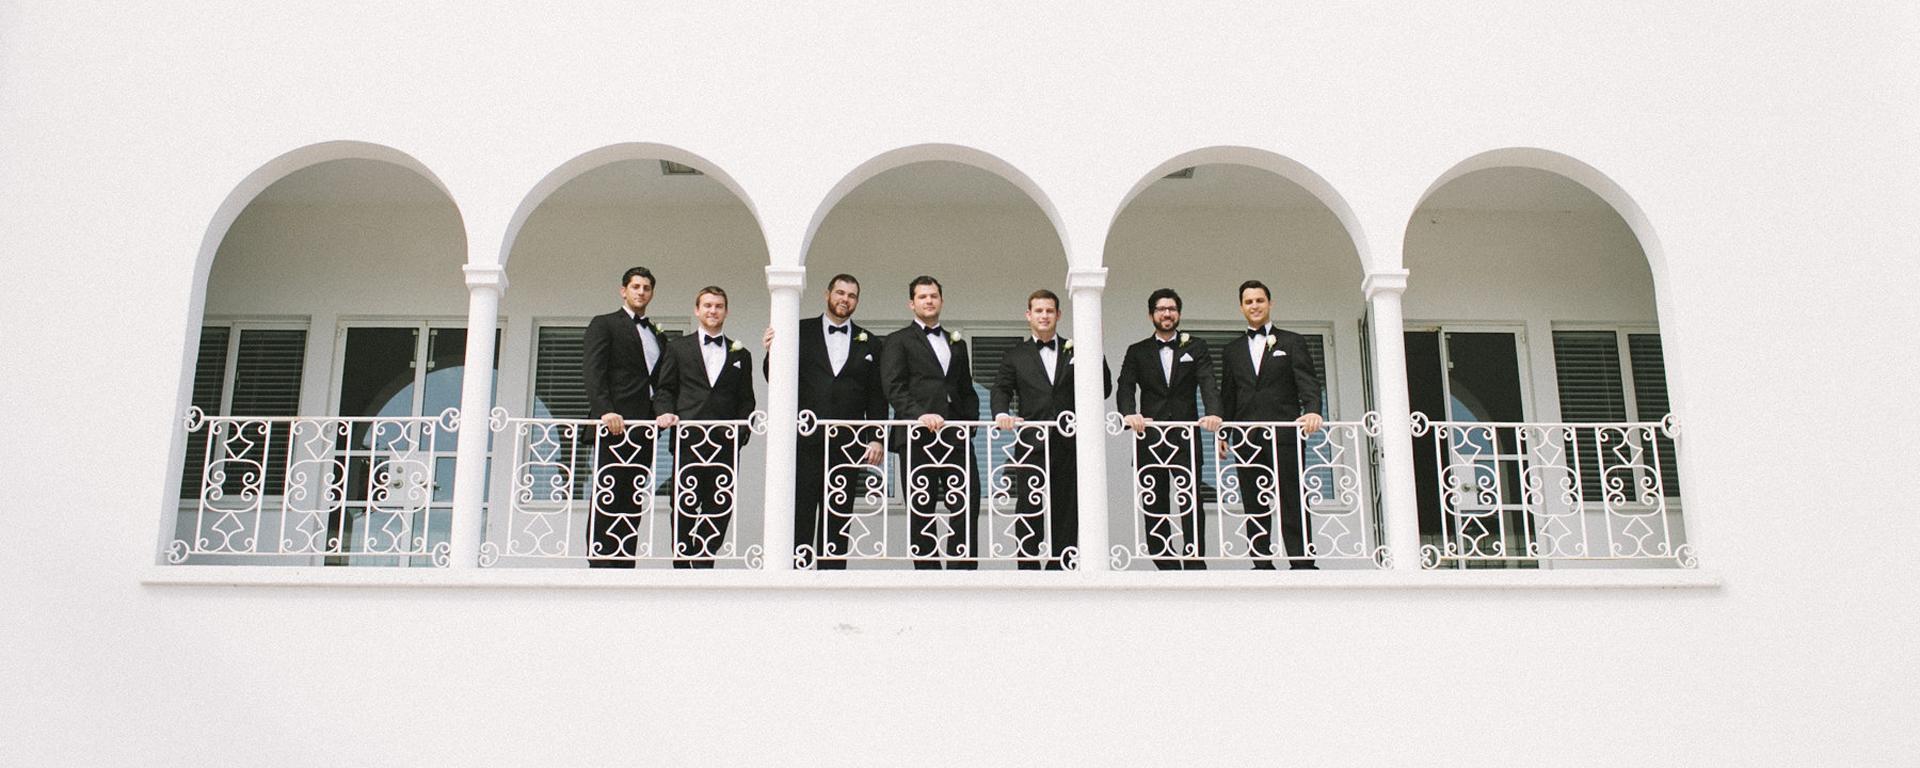 The Mansion at Tuckahoe groomsmen